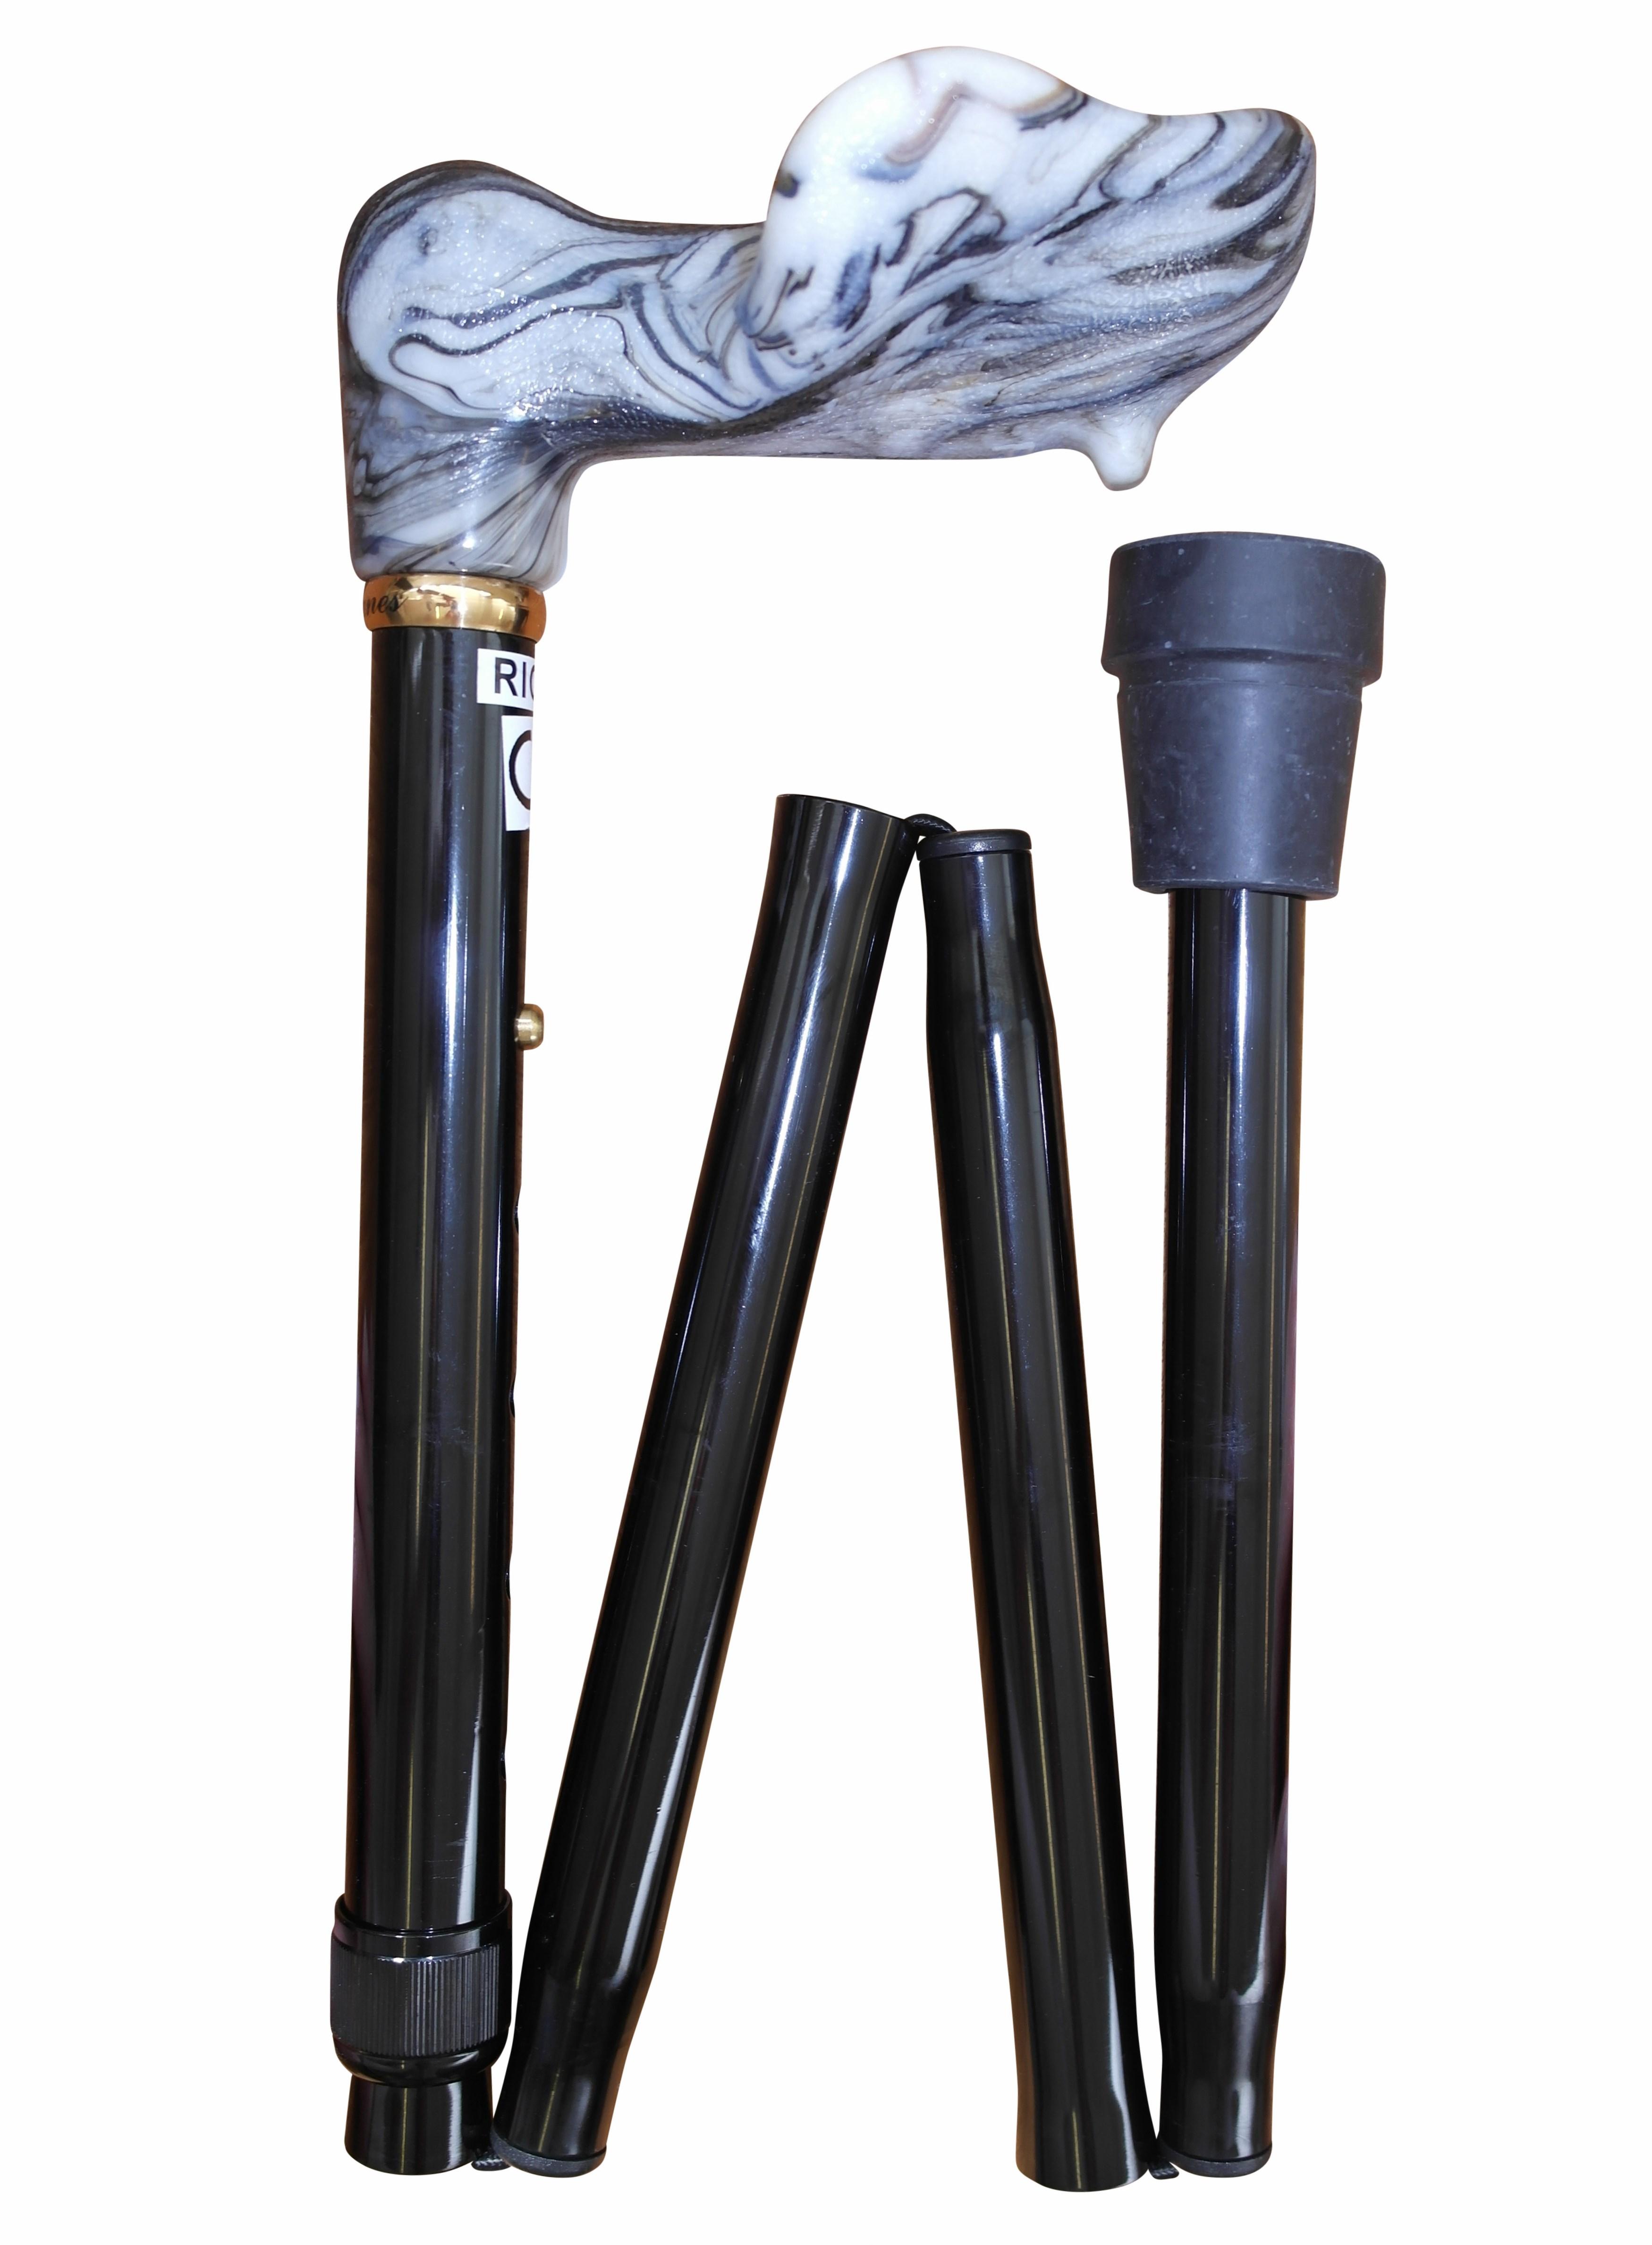 Image of   Foldbar stok med anatomisk greb, højdejusterbar, sort